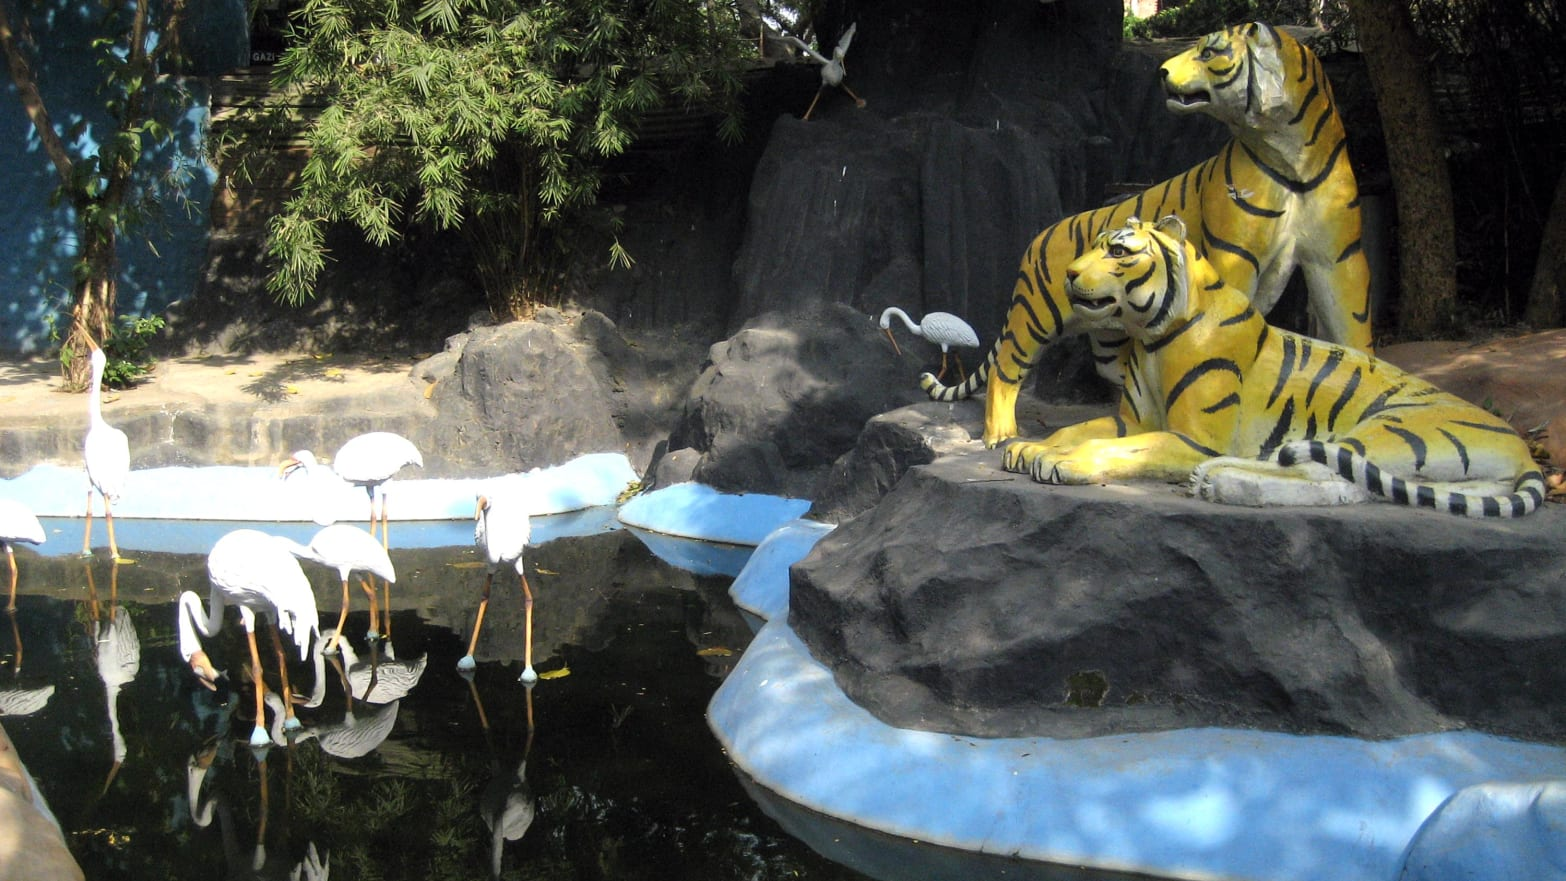 Dhaka, Bangladesh: Kitschy Theme Parks and Restaurants Are